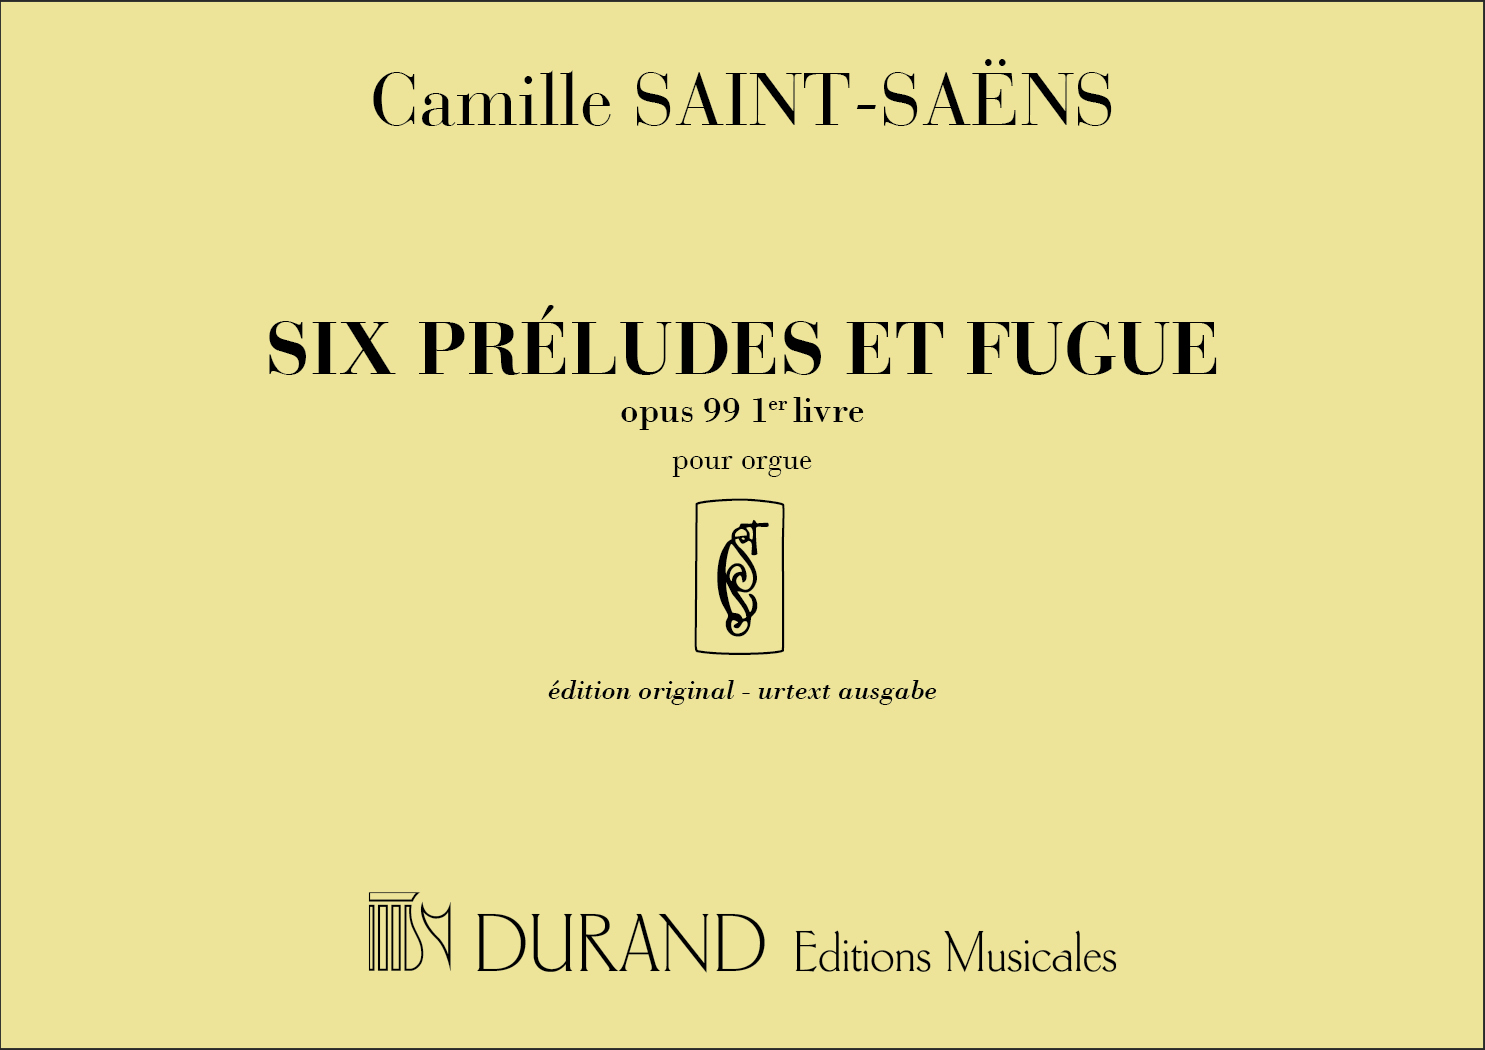 Camille Saint-Saëns: Six Preludes et Fugue opus 99 1er livre: Organ: